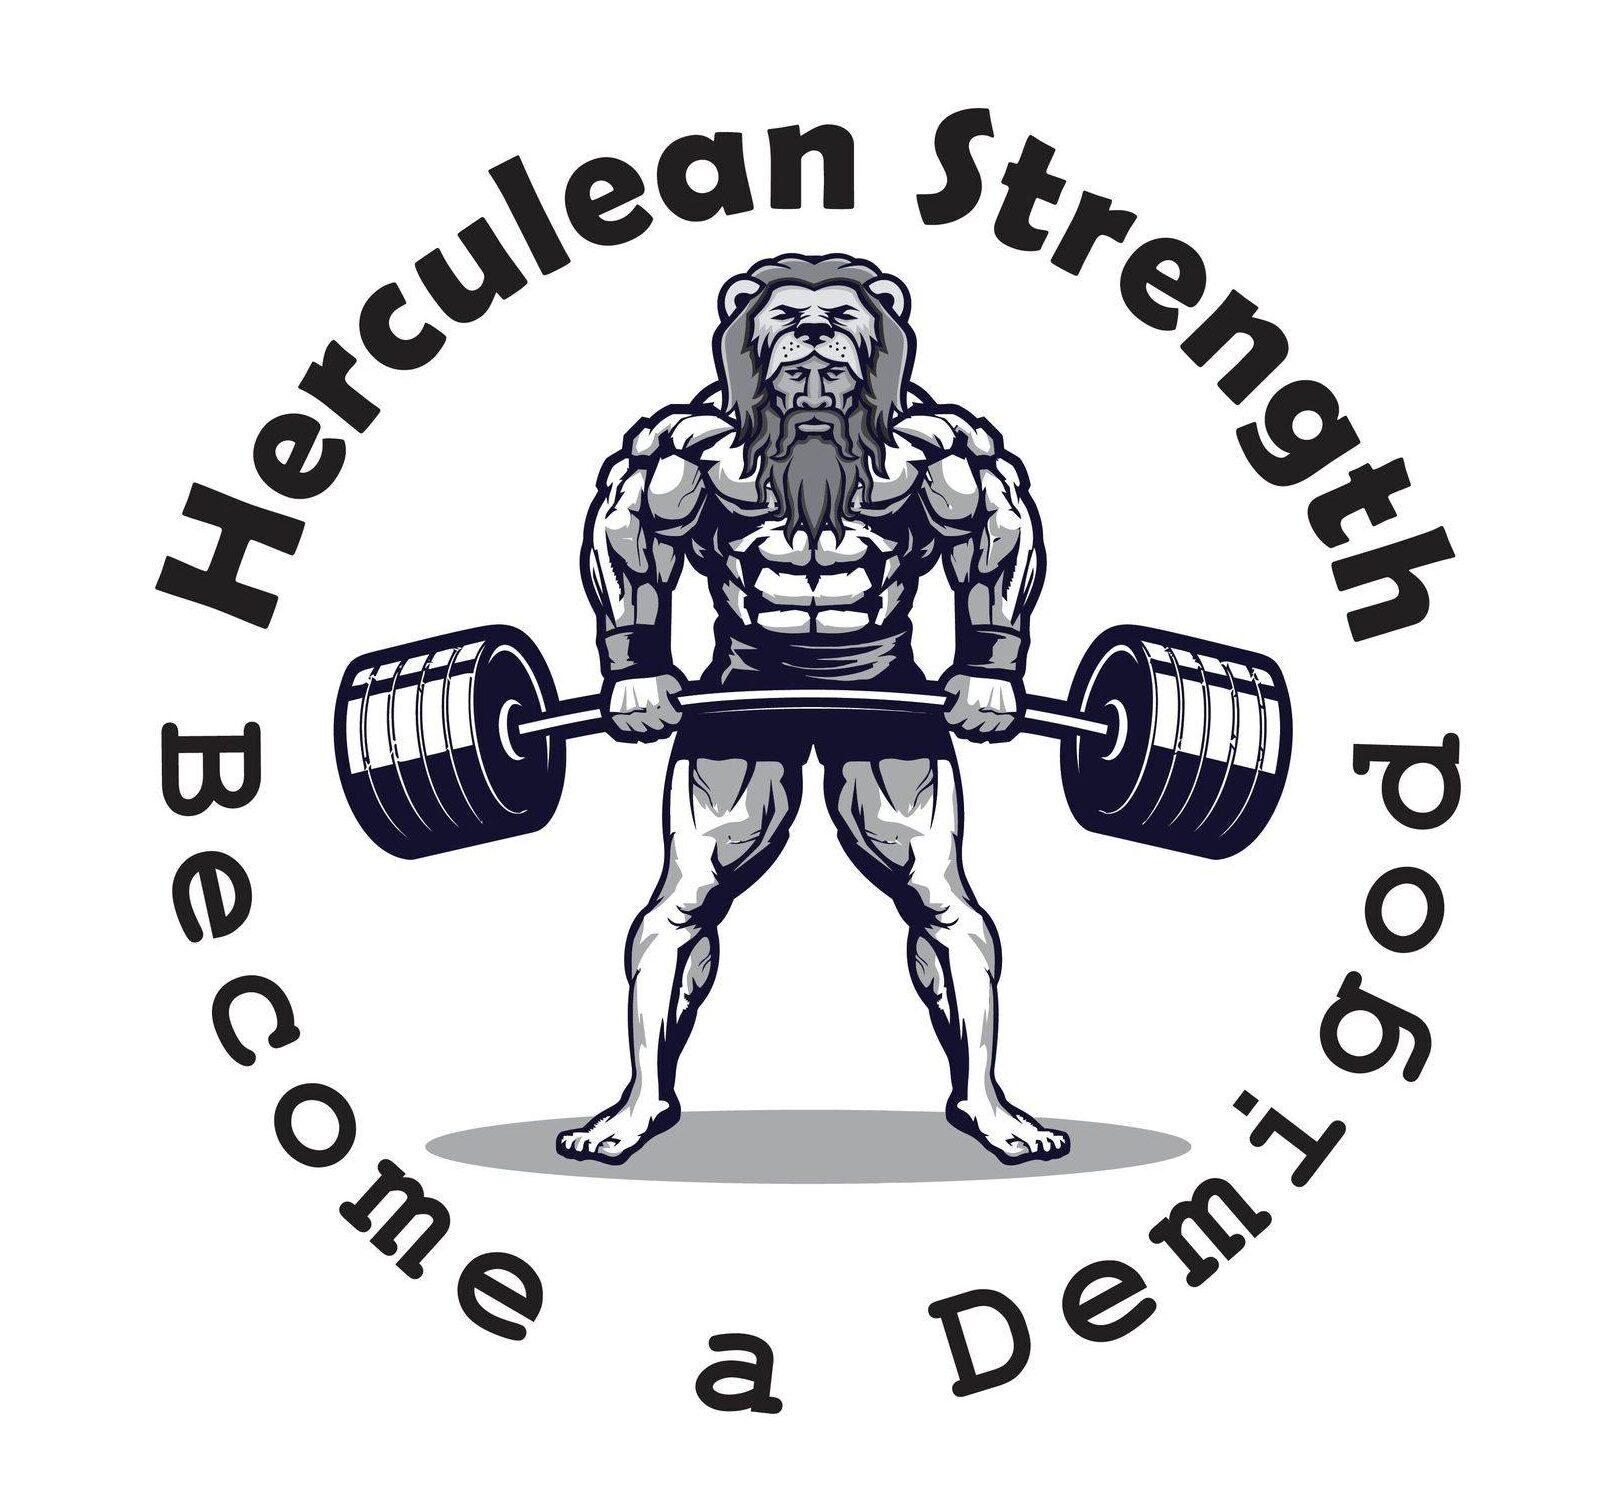 Herculean Strength